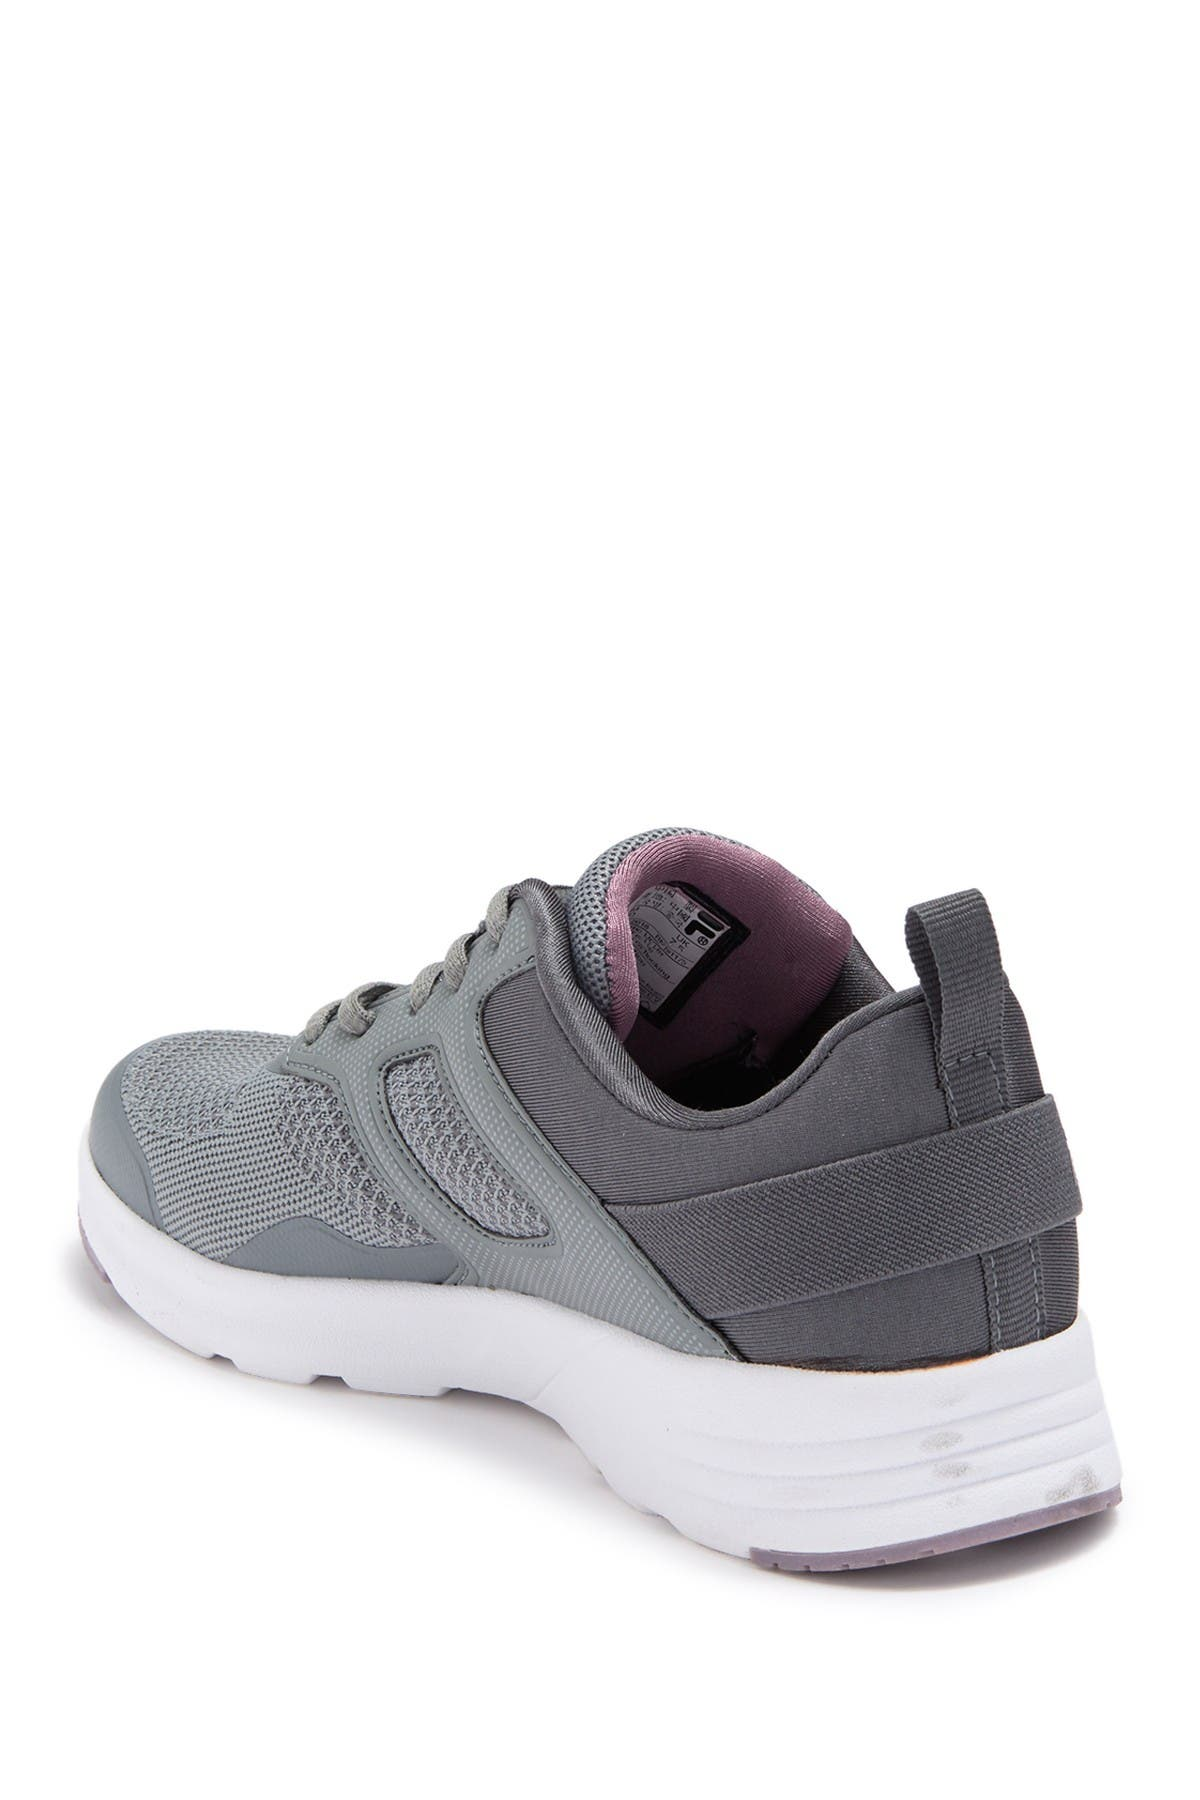 Image of FILA USA Memory Frame V6 Sneaker